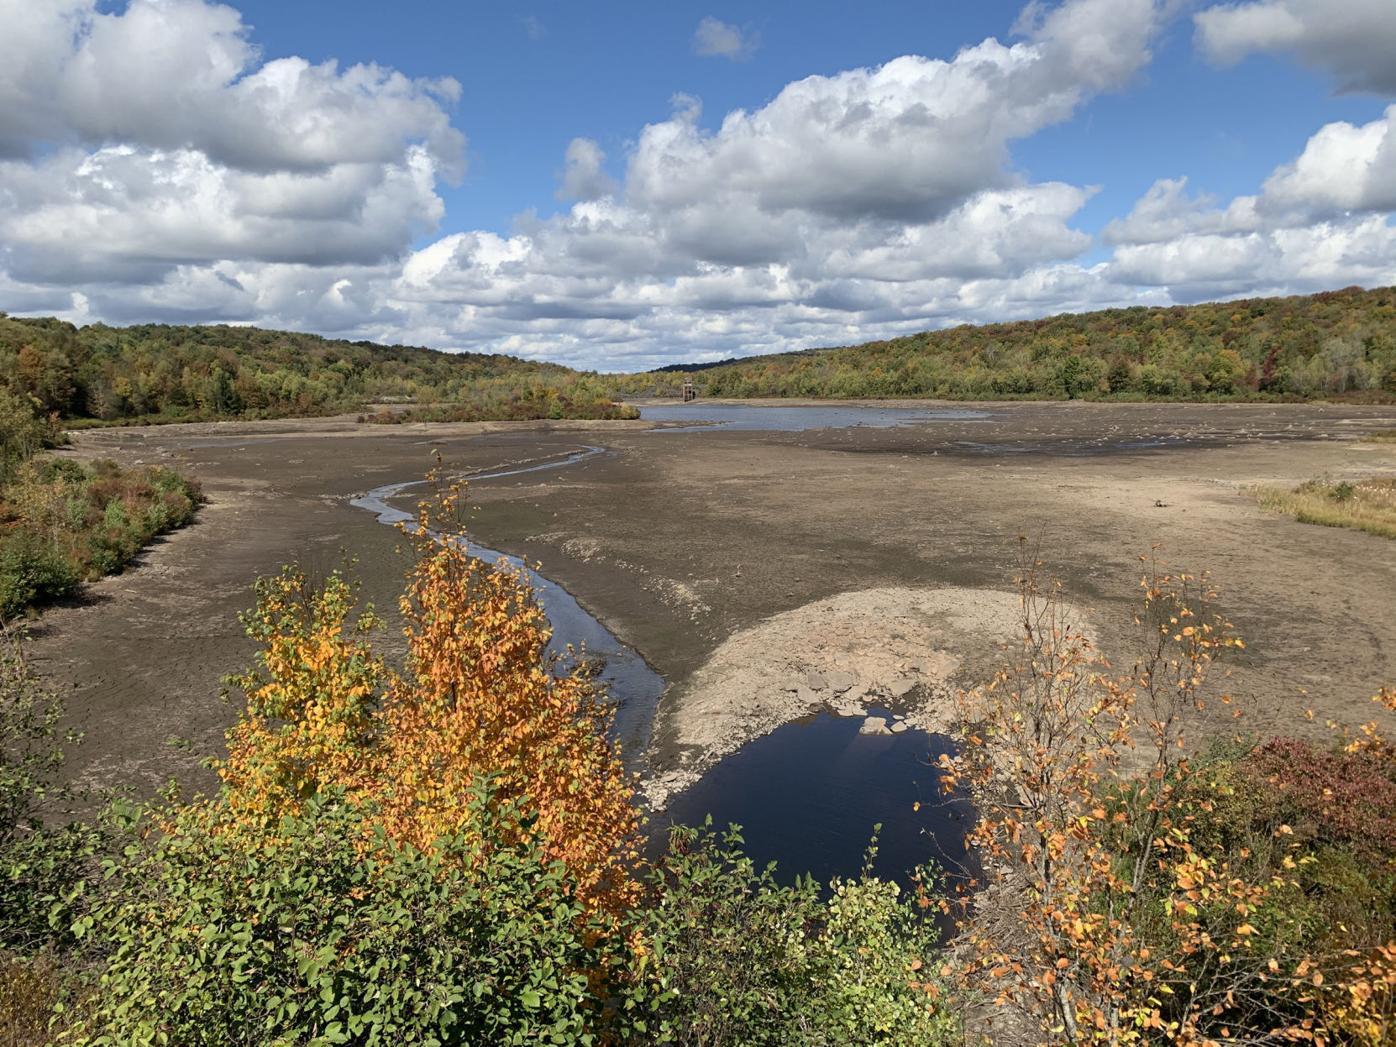 Draining of reservoir reveals submerged stolen pickup truck